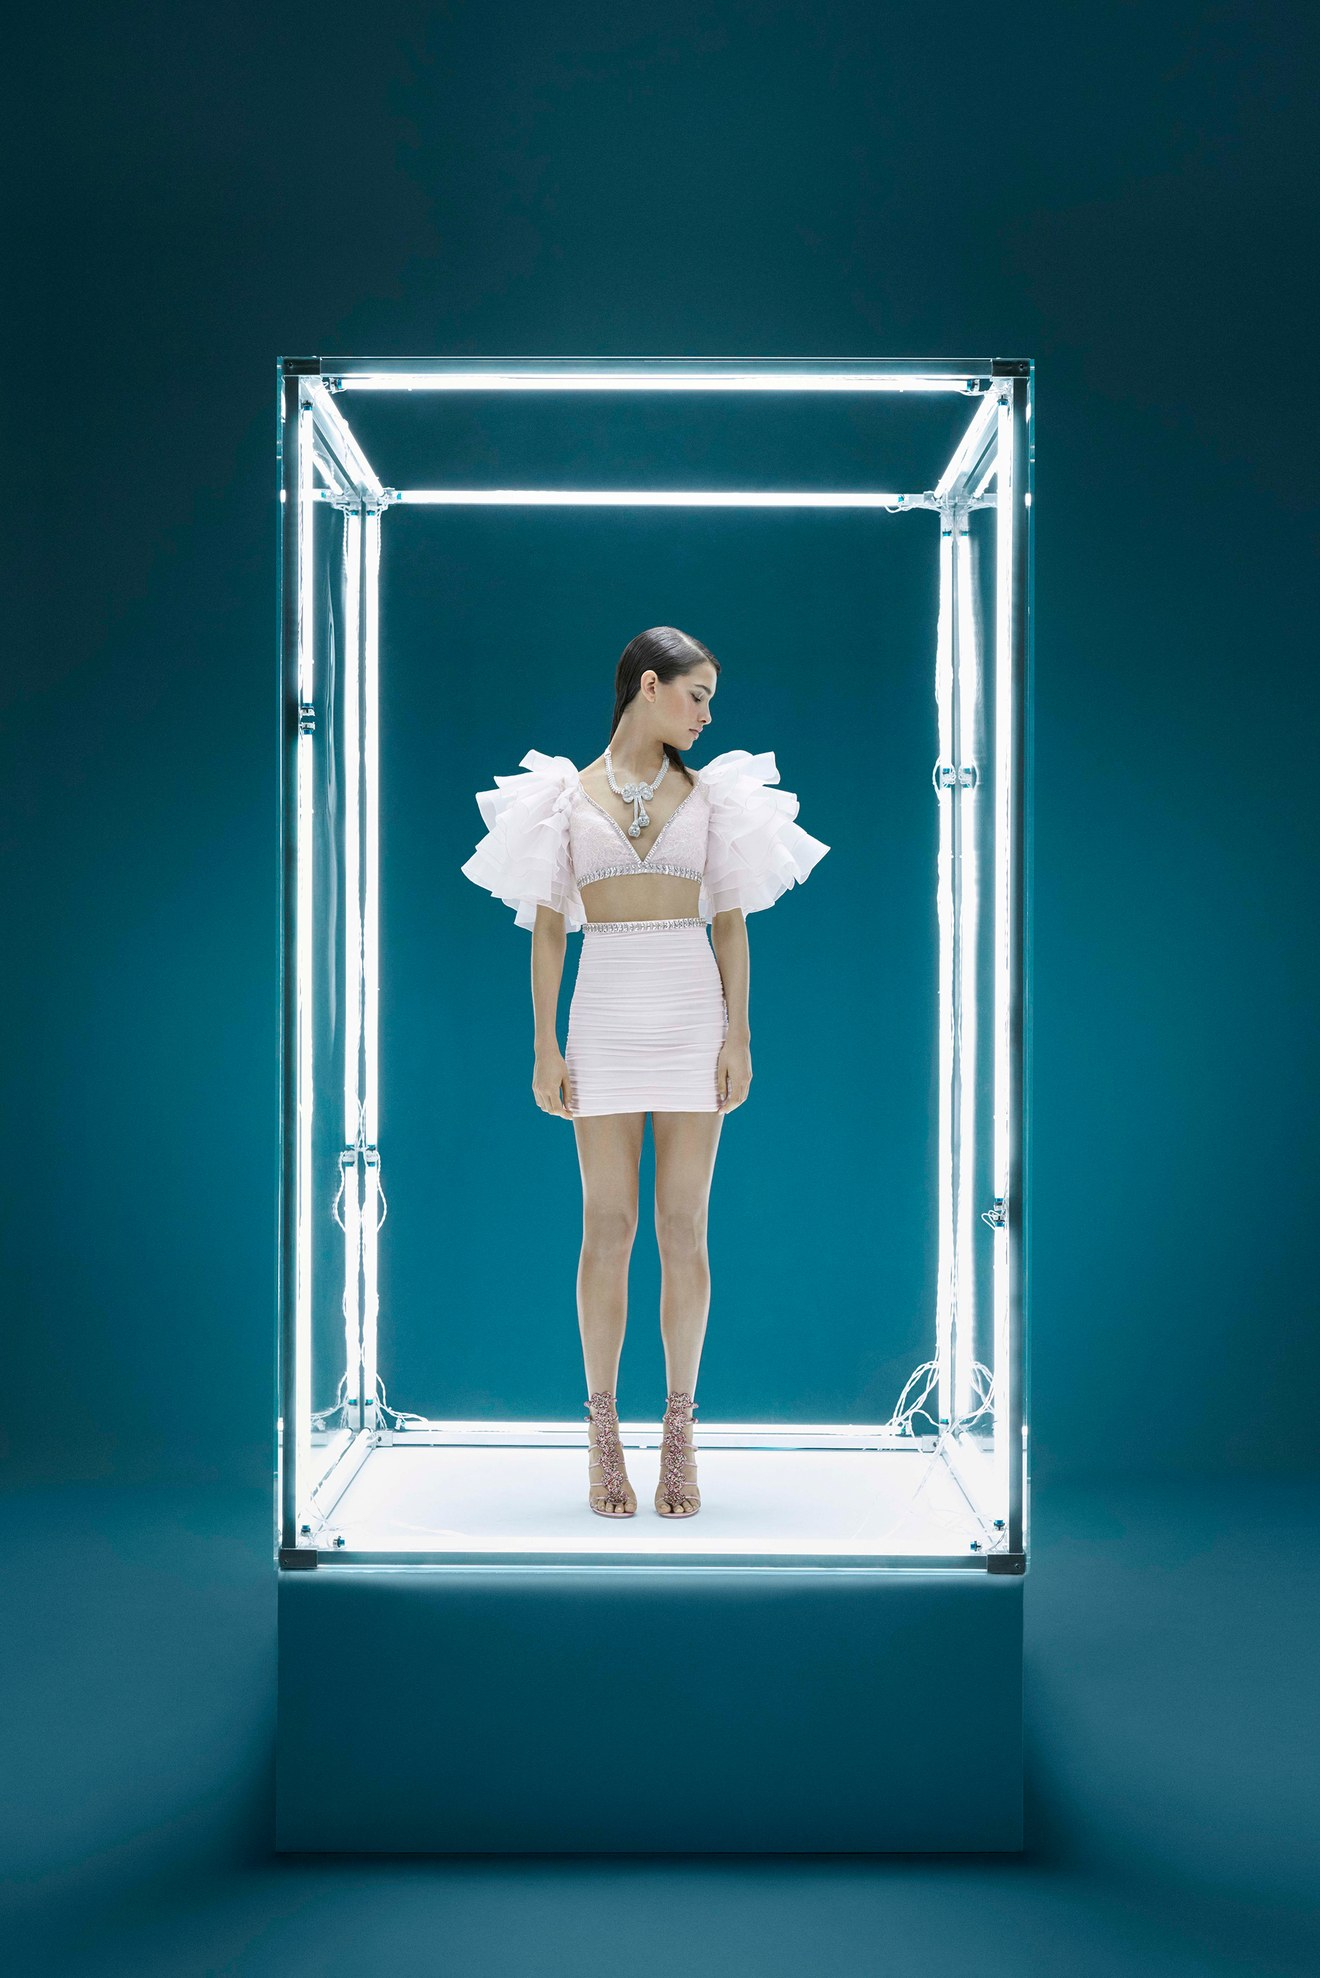 giambattista valli x h&m designer collaboration